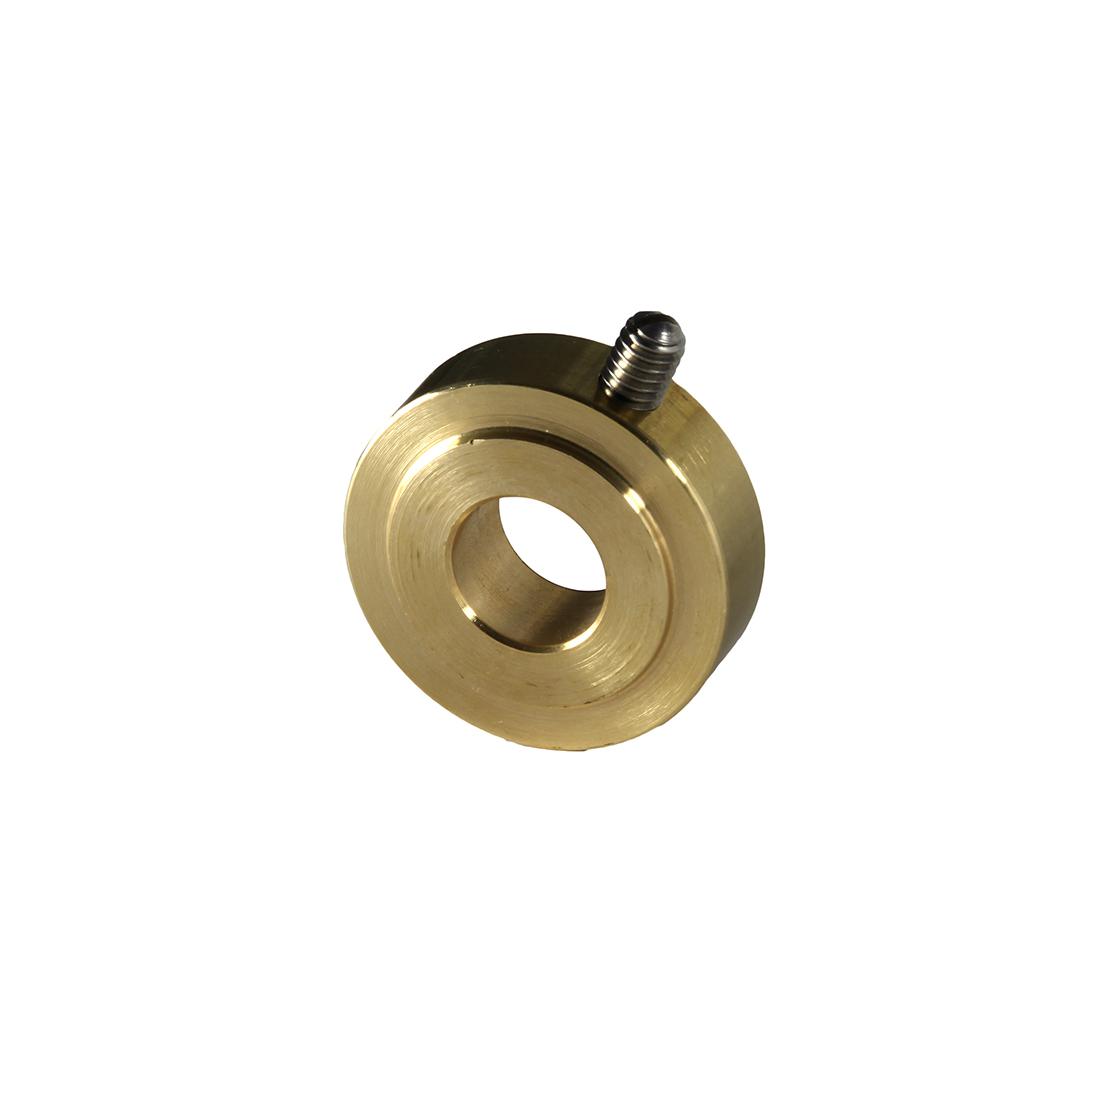 ALFA P 1026 Brass Collar With Set Screw For VS 12DH ALFA